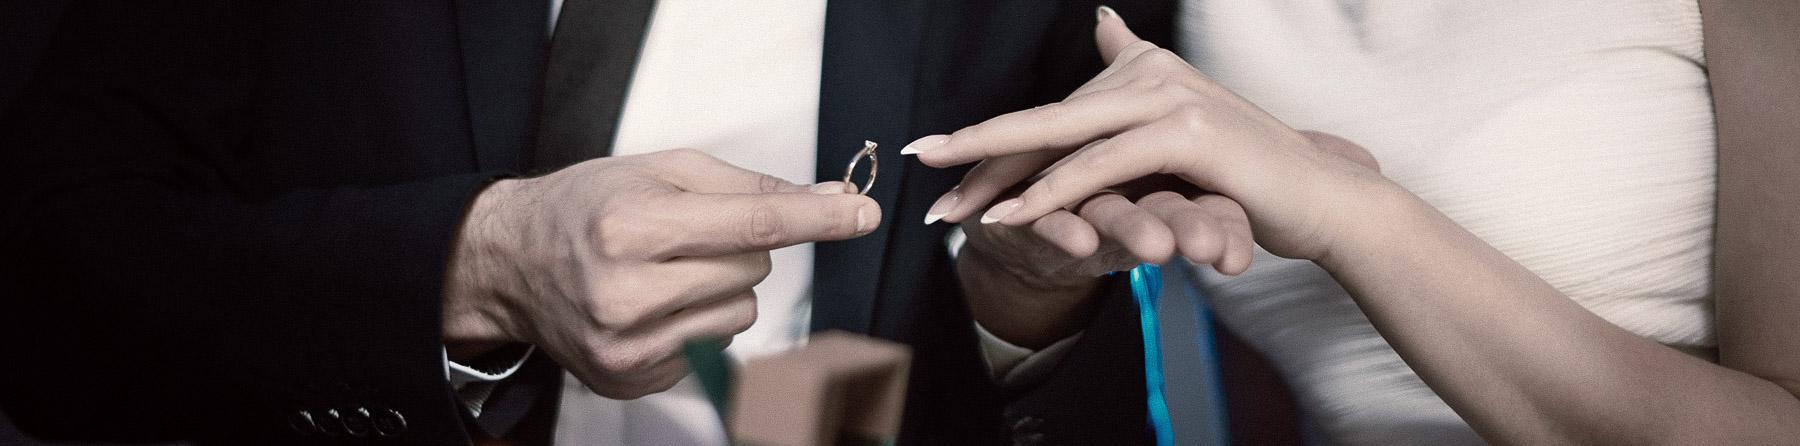 Weddings at Sinclairfort Worth Hotel, Texas